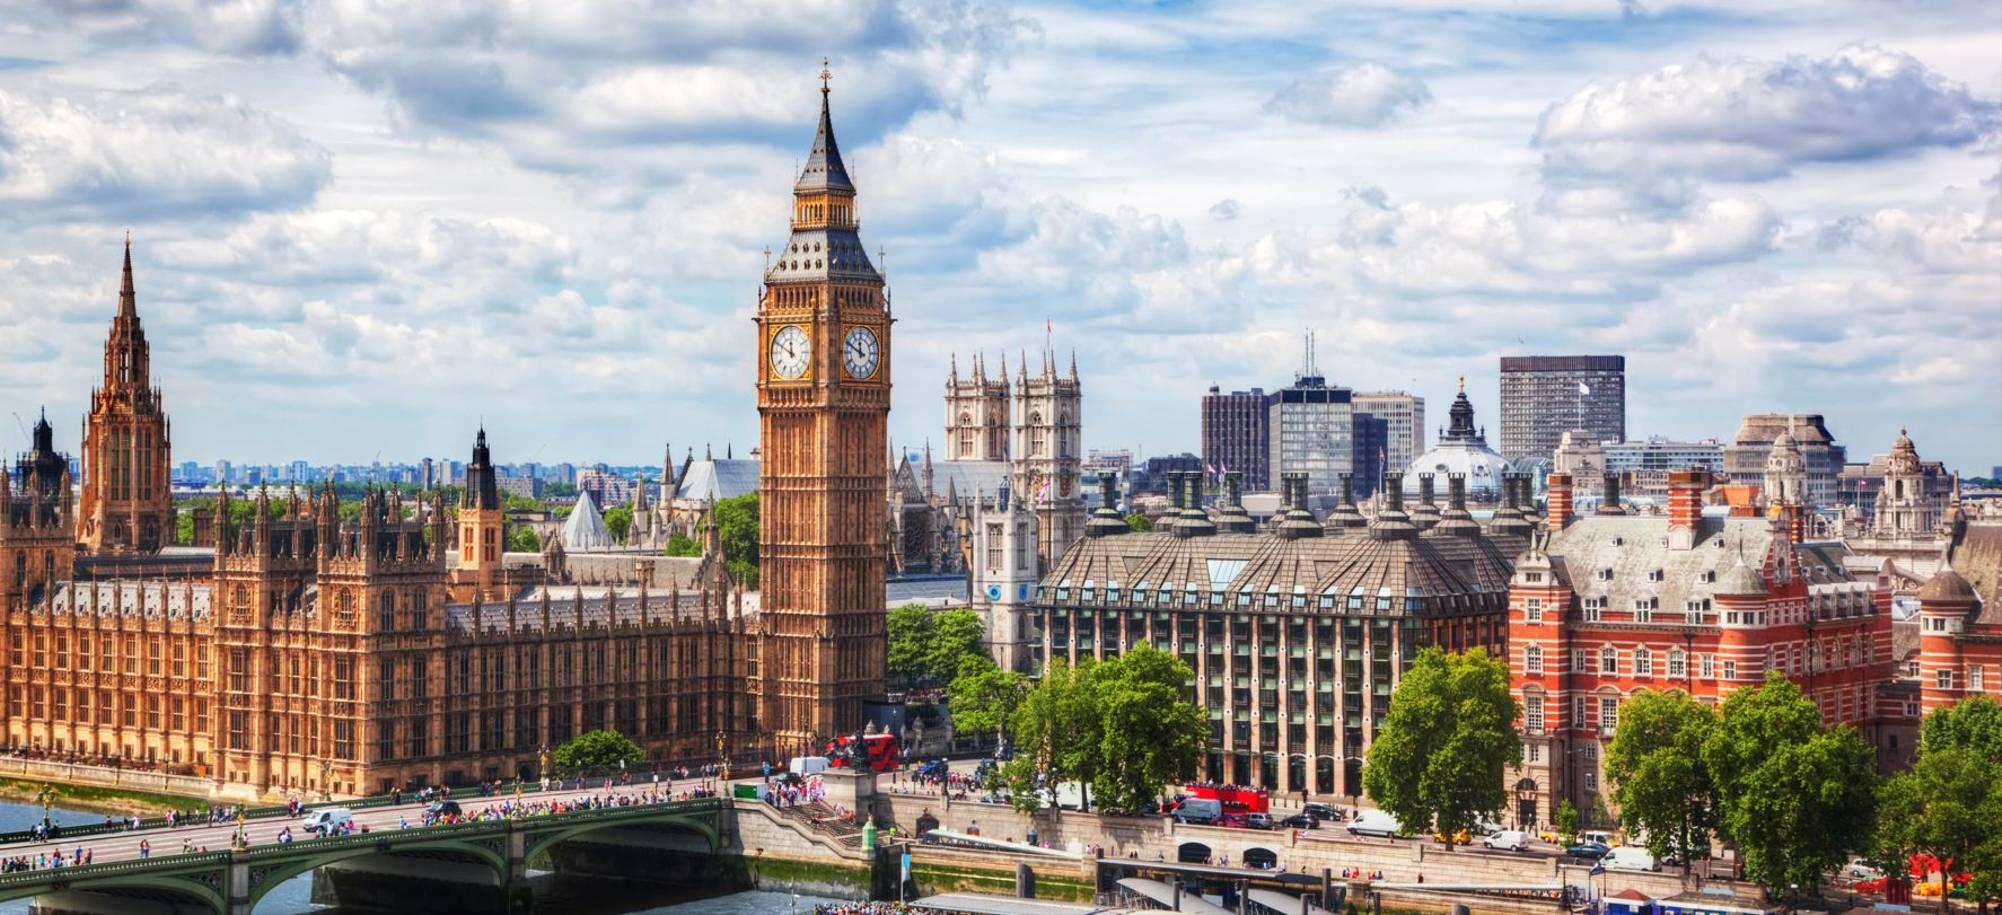 London - Big Ben, Houses of Parliament and Westminster Bridge - Itinerary Desktop .jpg